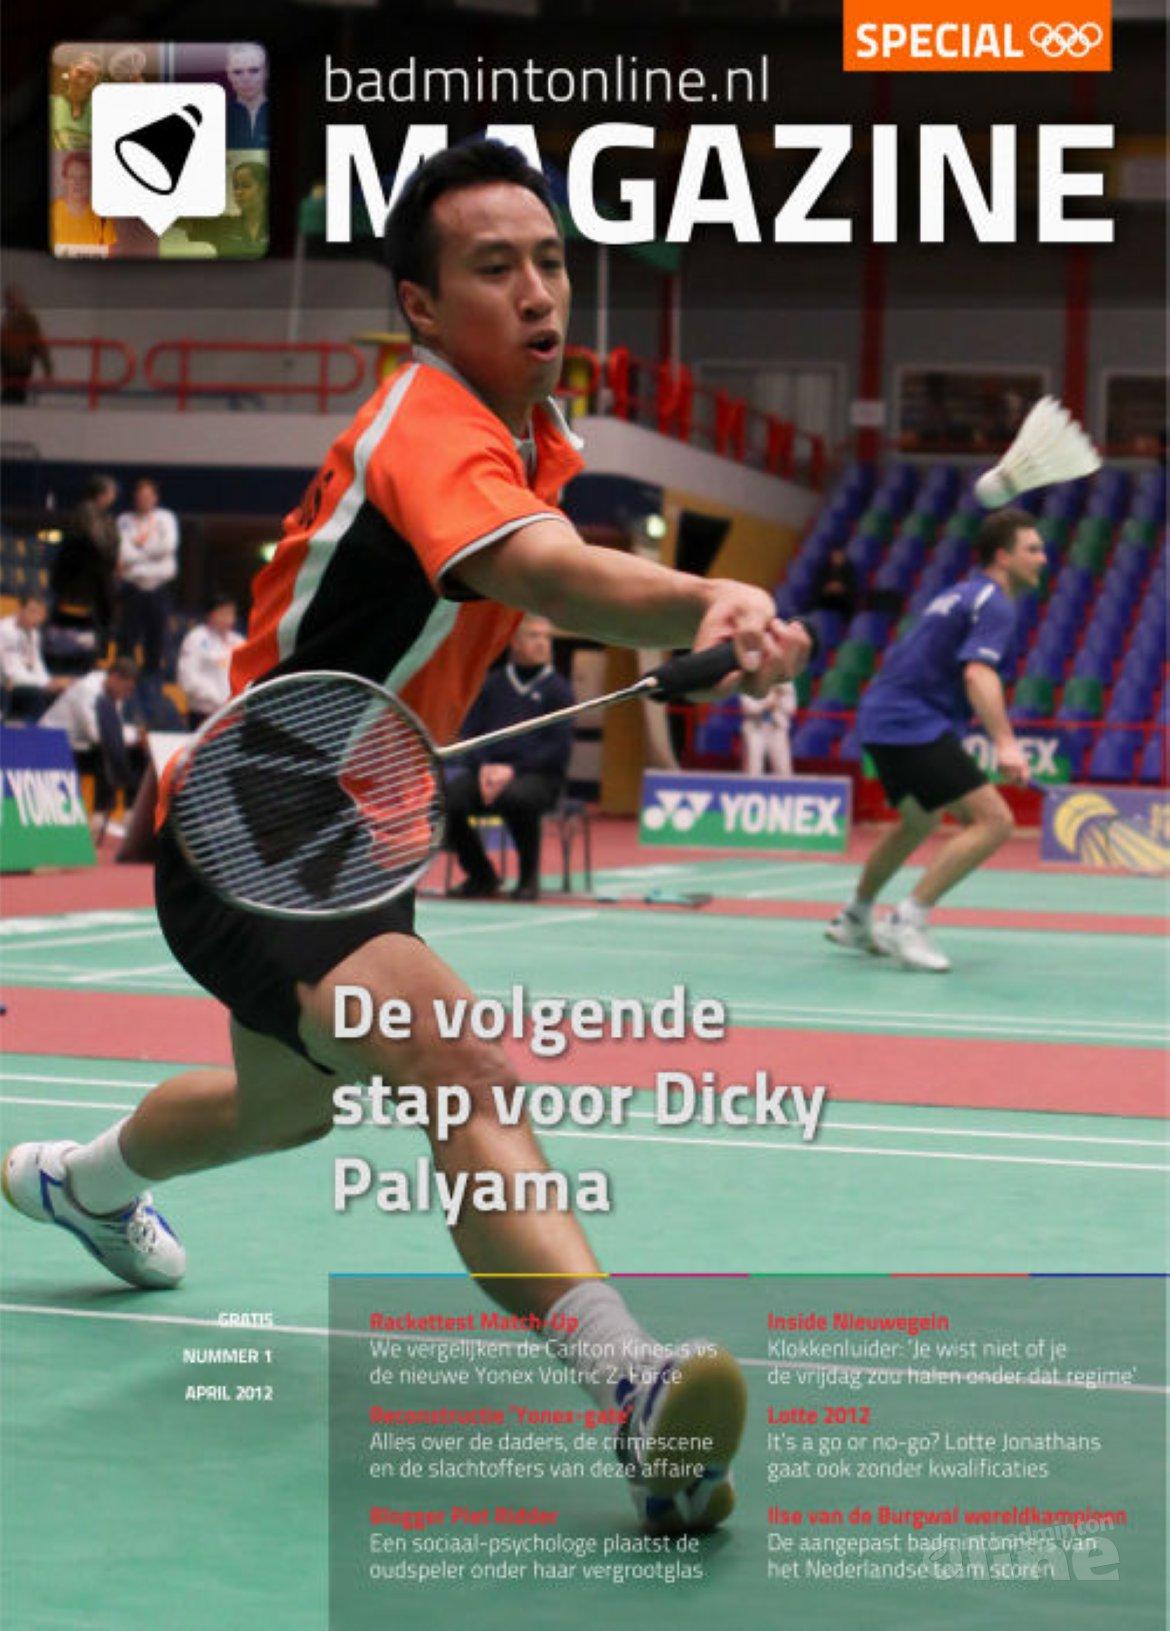 cover badmintonline.nl MAGAZINE